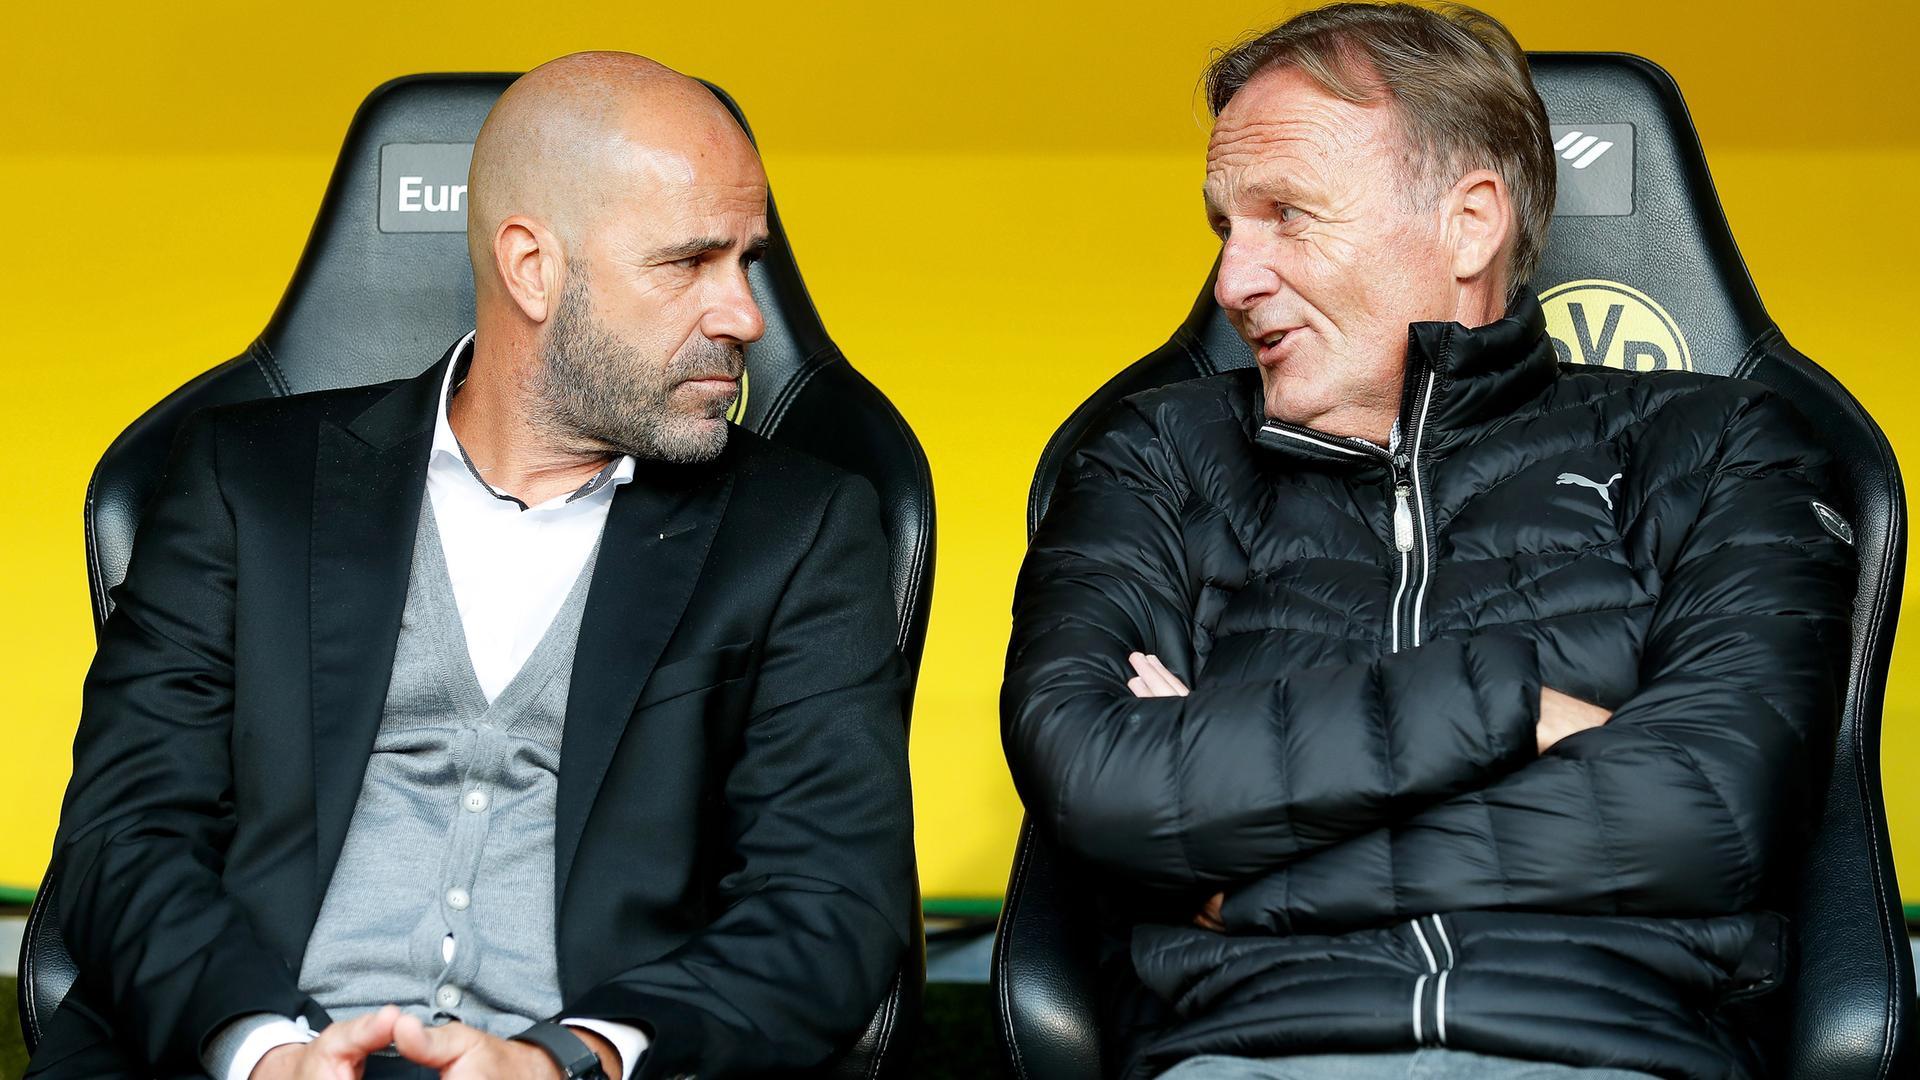 Dortmunder Zeitspiel Zdfmediathek